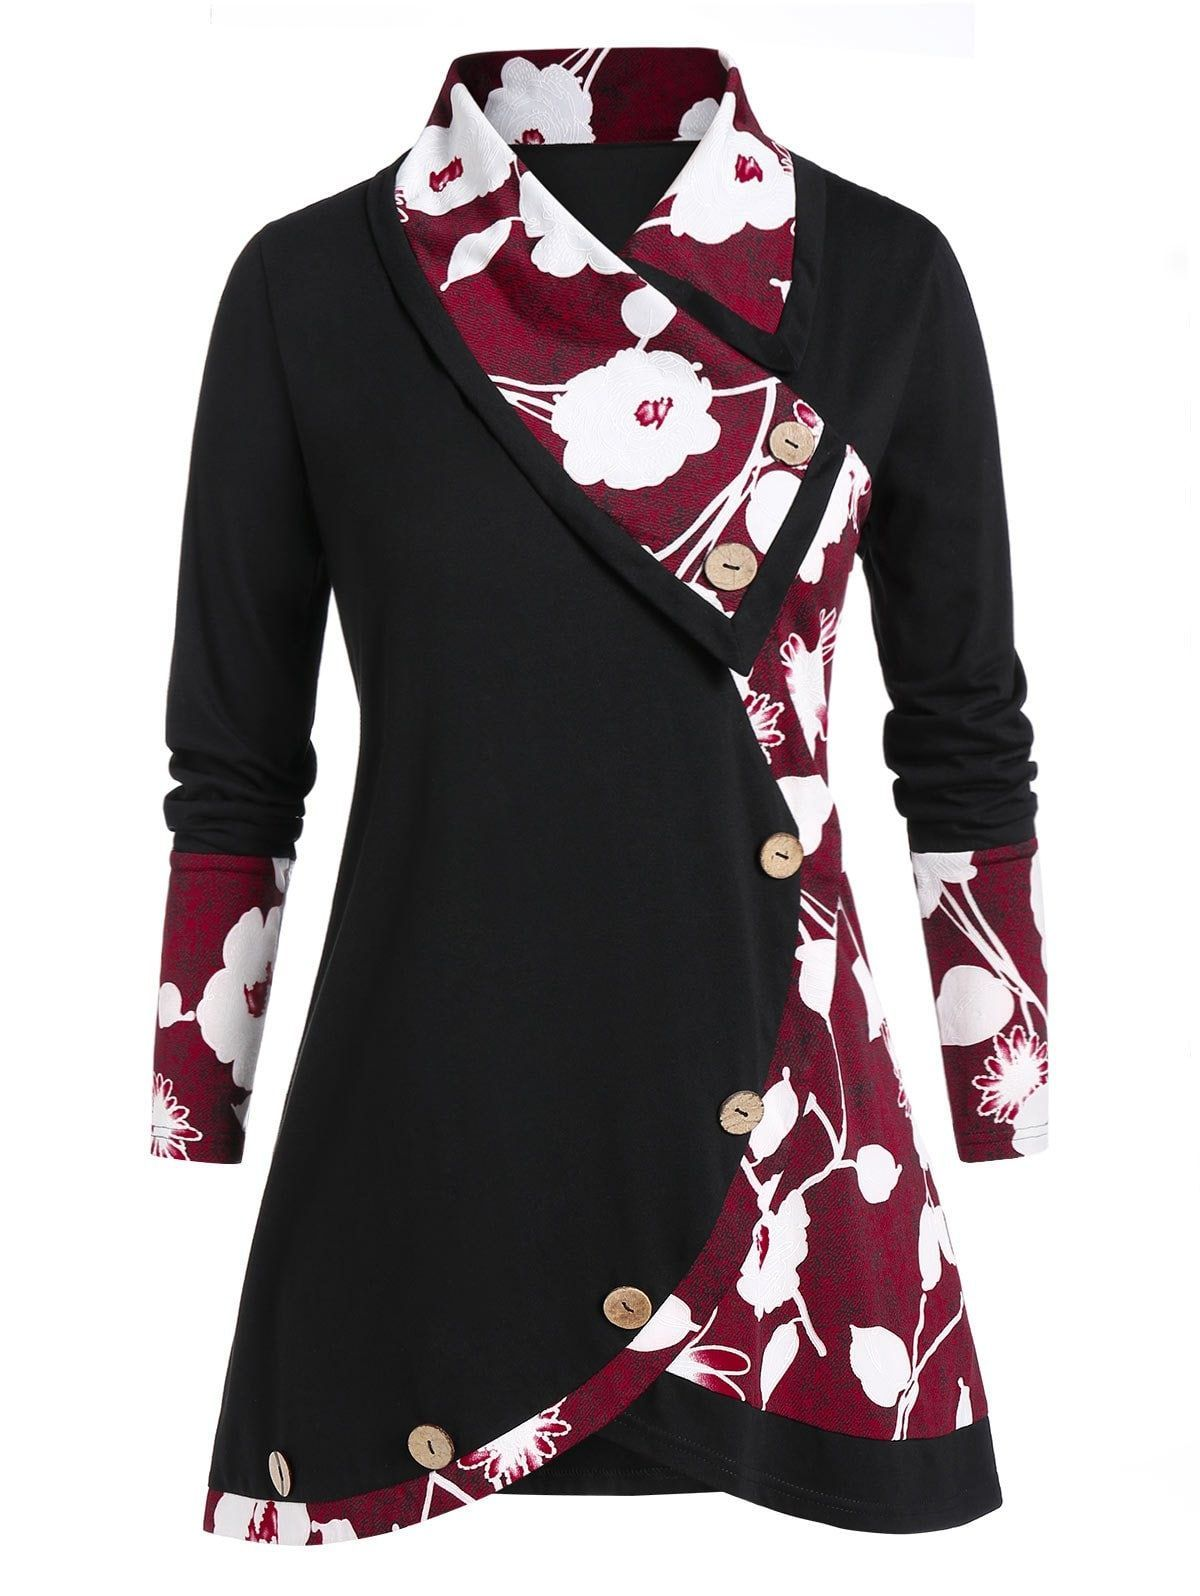 DressLily / Plus Size Long Sleeve Floral Print Tunic T Shirt#dresslily #floral #long #print #shirt #size #sleeve #tunic